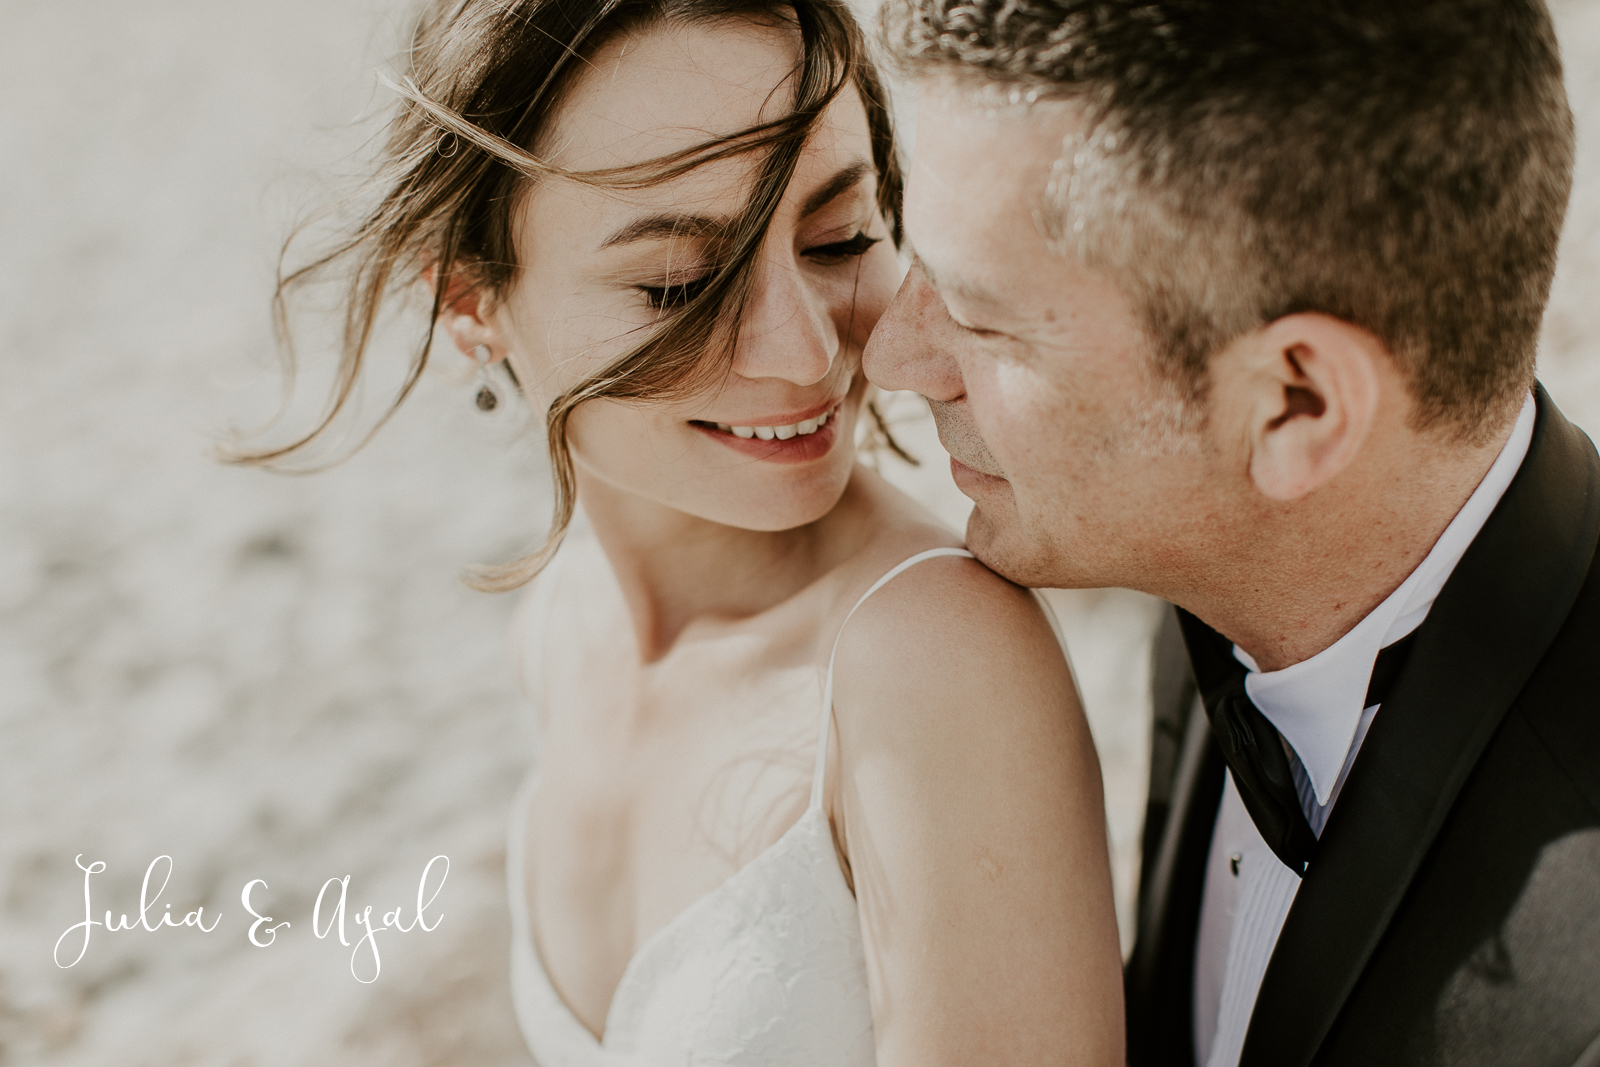 intimate-elopement-cyprus-wedding-photographer-cover.jpg